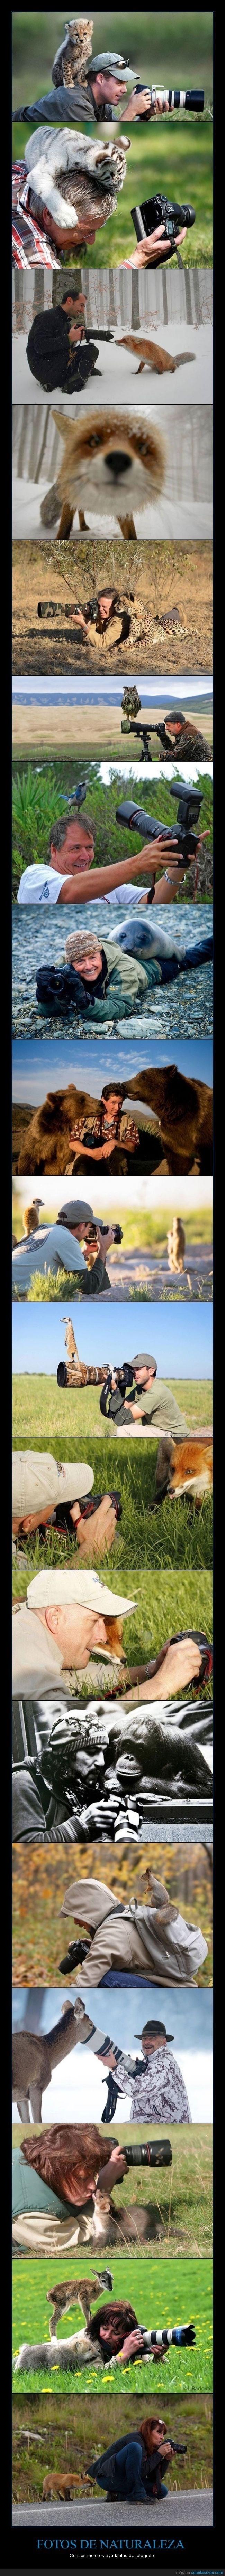 lista de fotografos acompanados por sus objetivos